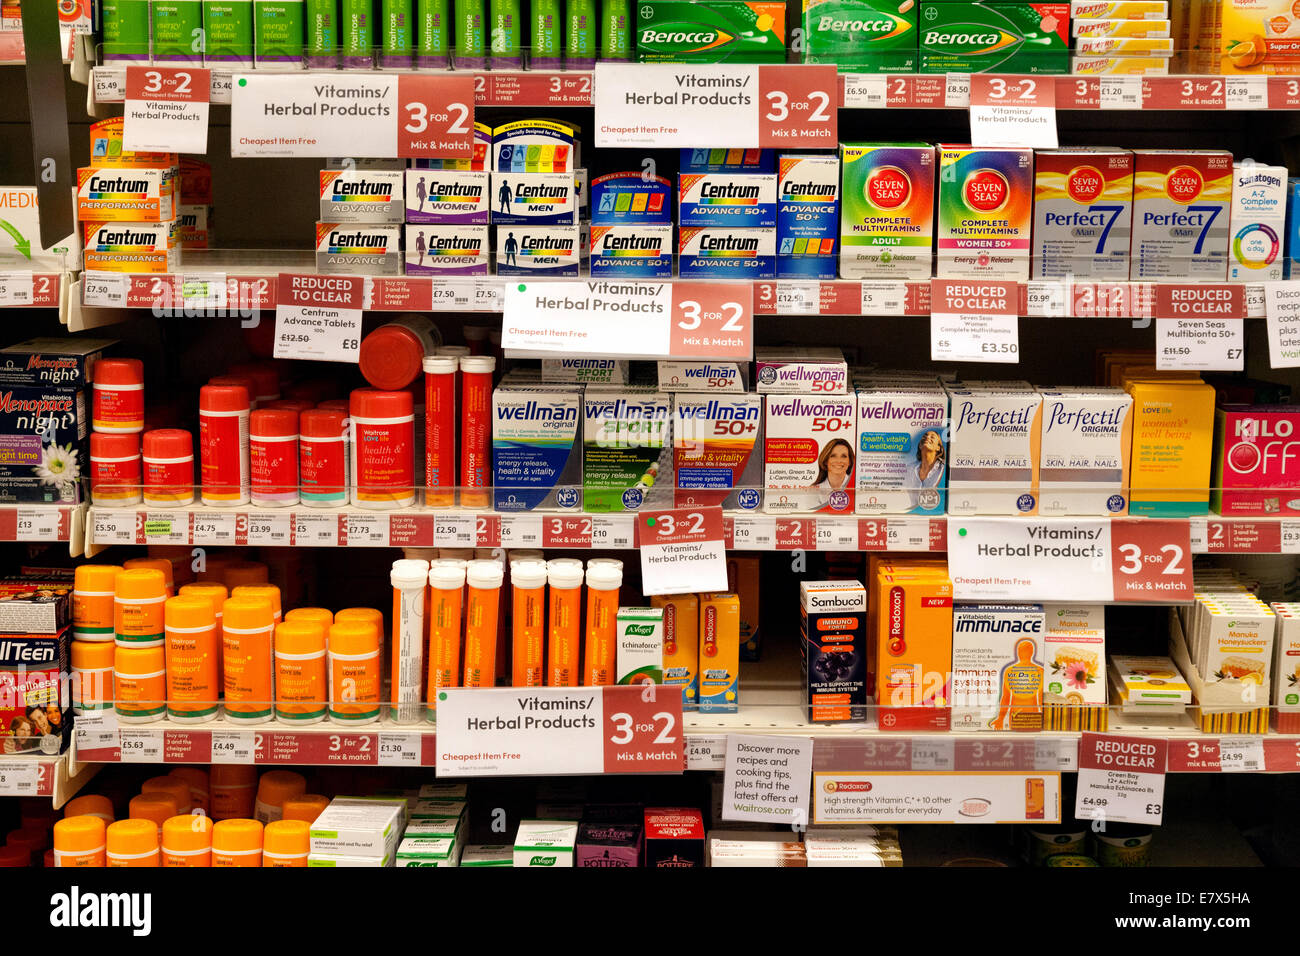 Vitamins and multivitamins for sale on supermarket shelves, Waitrose, Newmarket UK - Stock Image